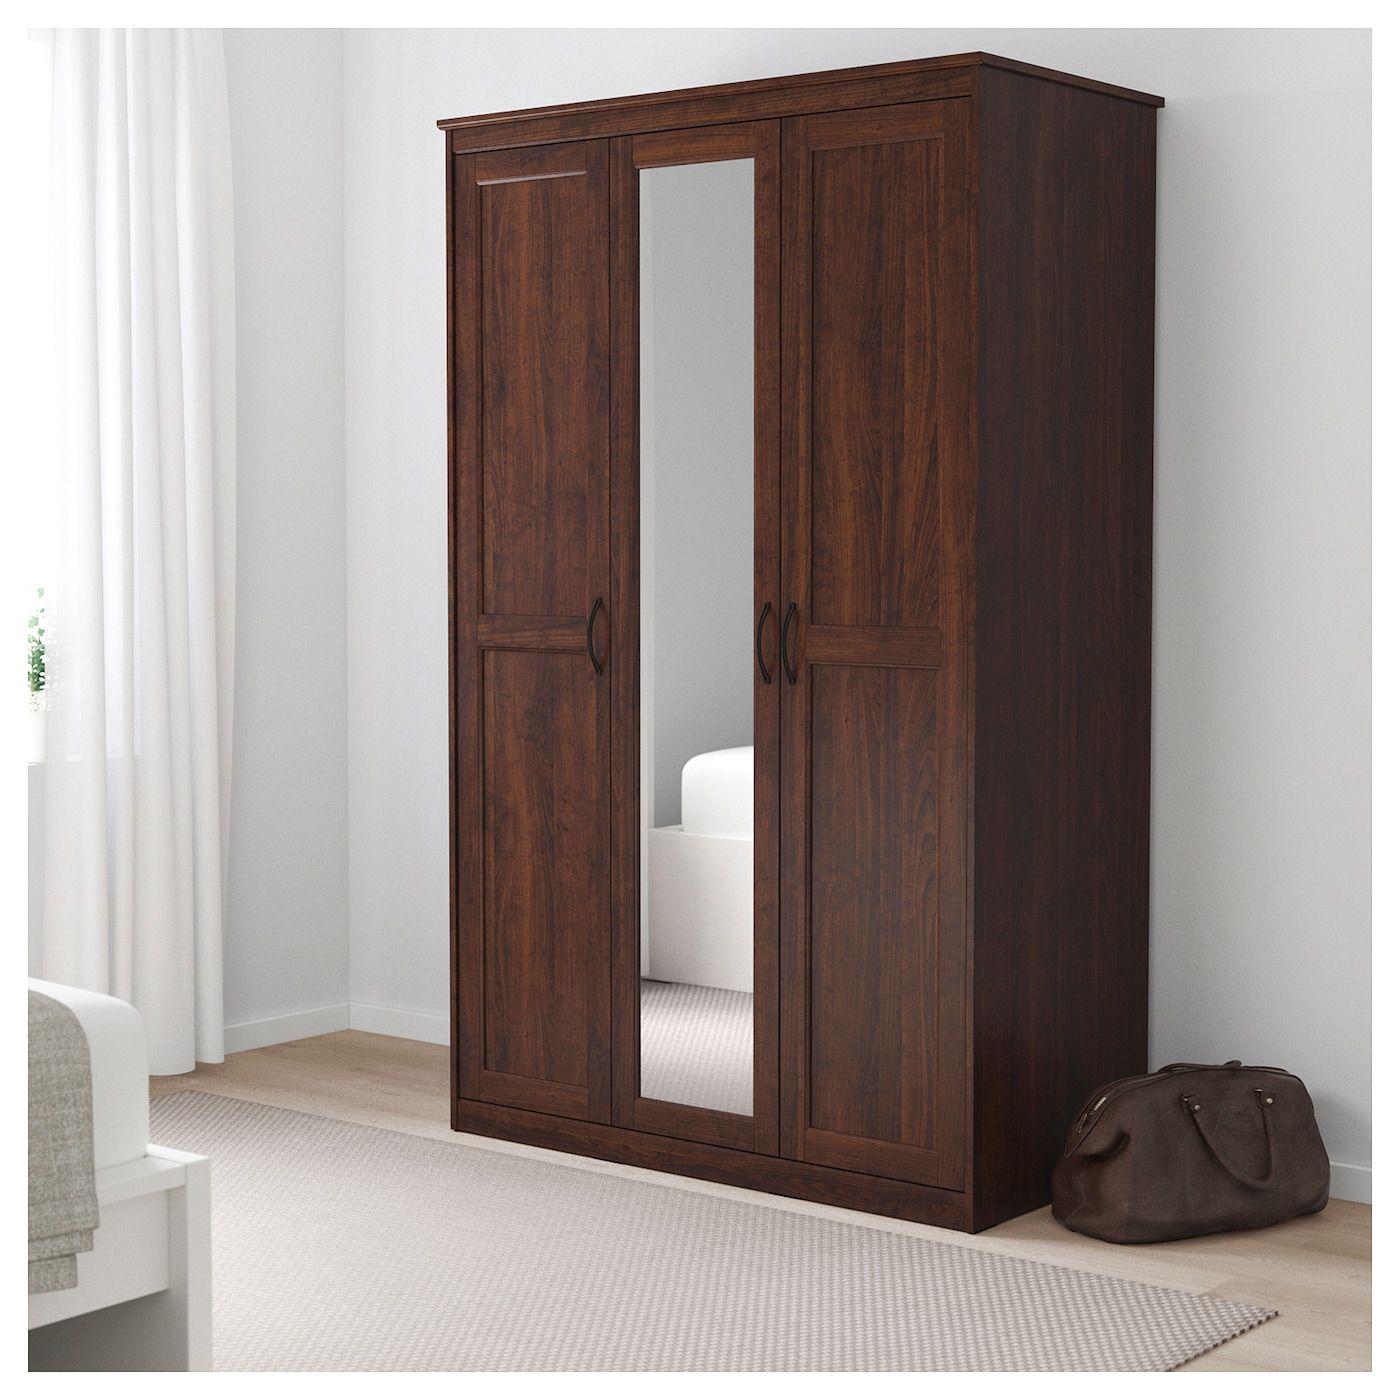 Songesand Wardrobe Brown 120x60x191 Cm Ikea Wardrobe Ikea